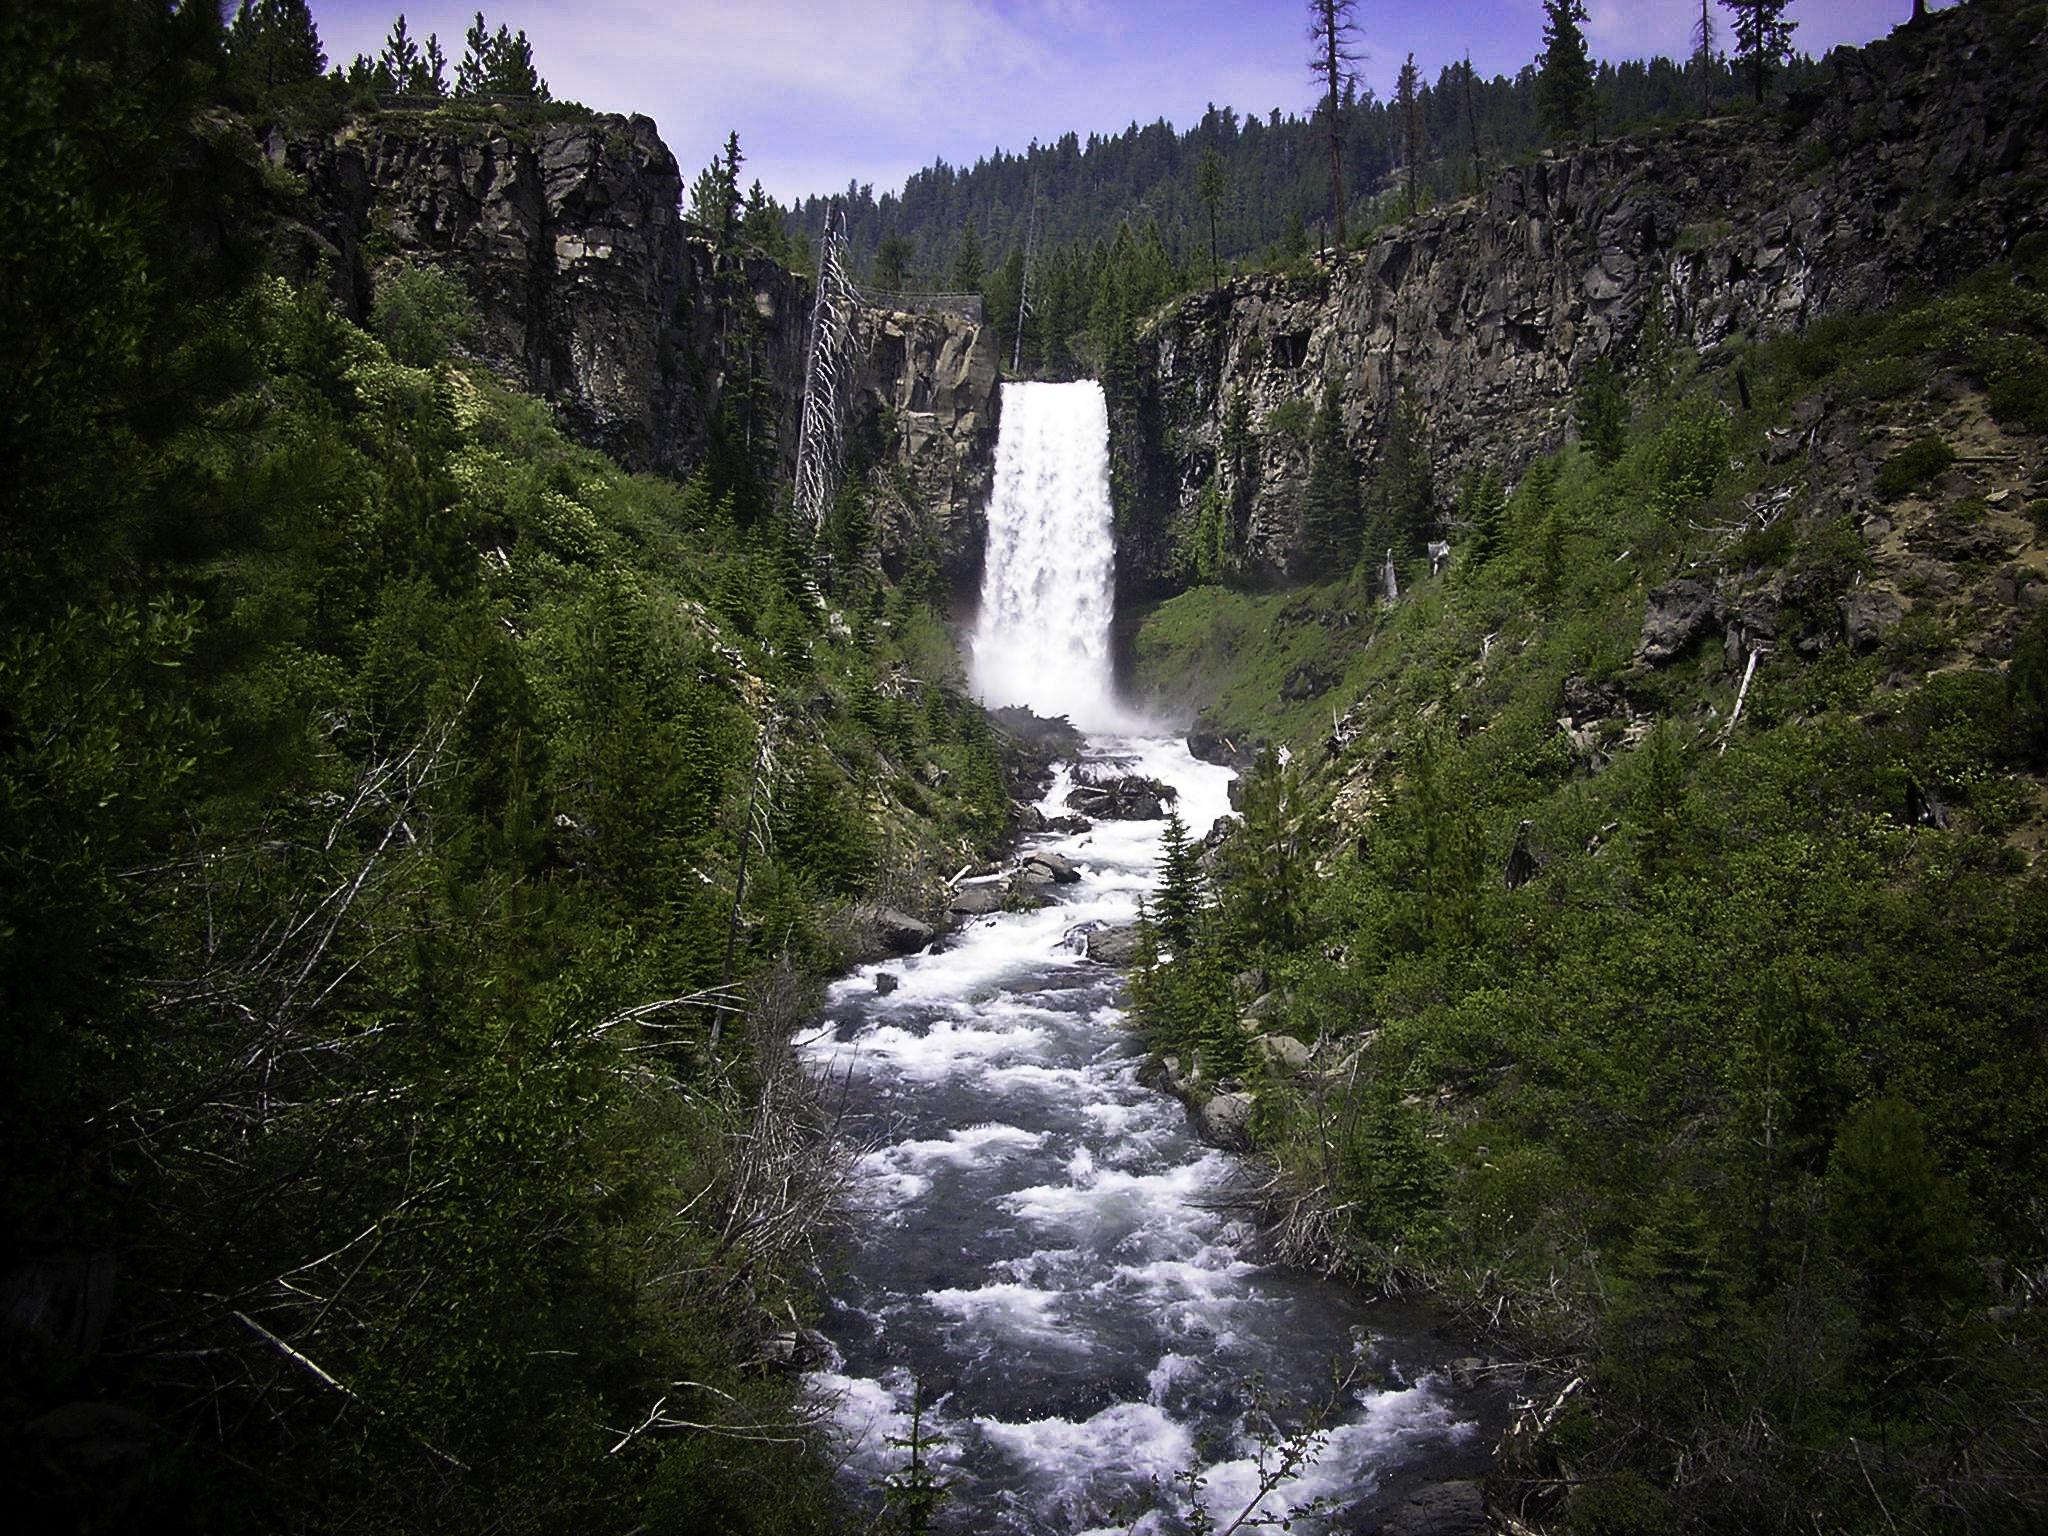 Tumelo Falls